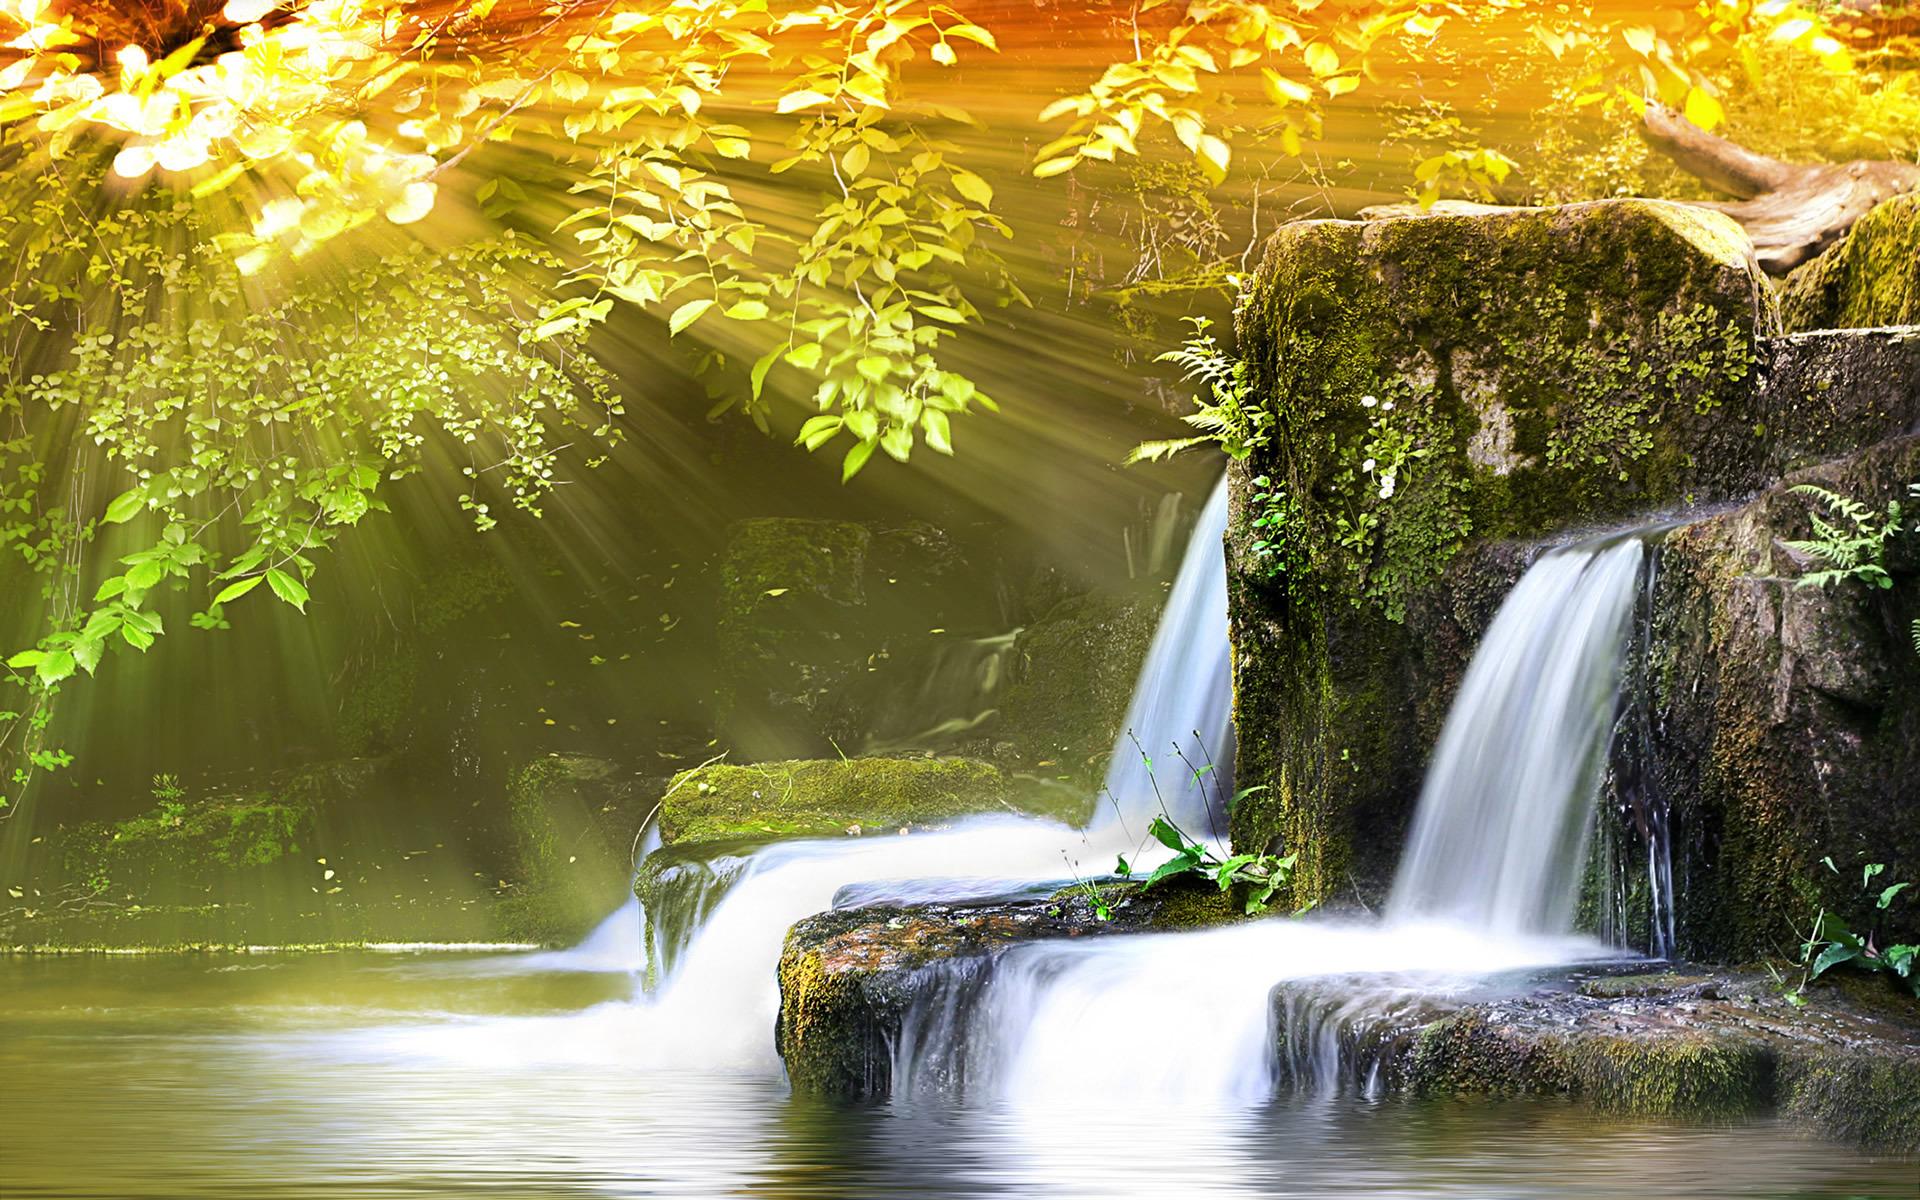 Pretty Nature Up Close Wallpaper